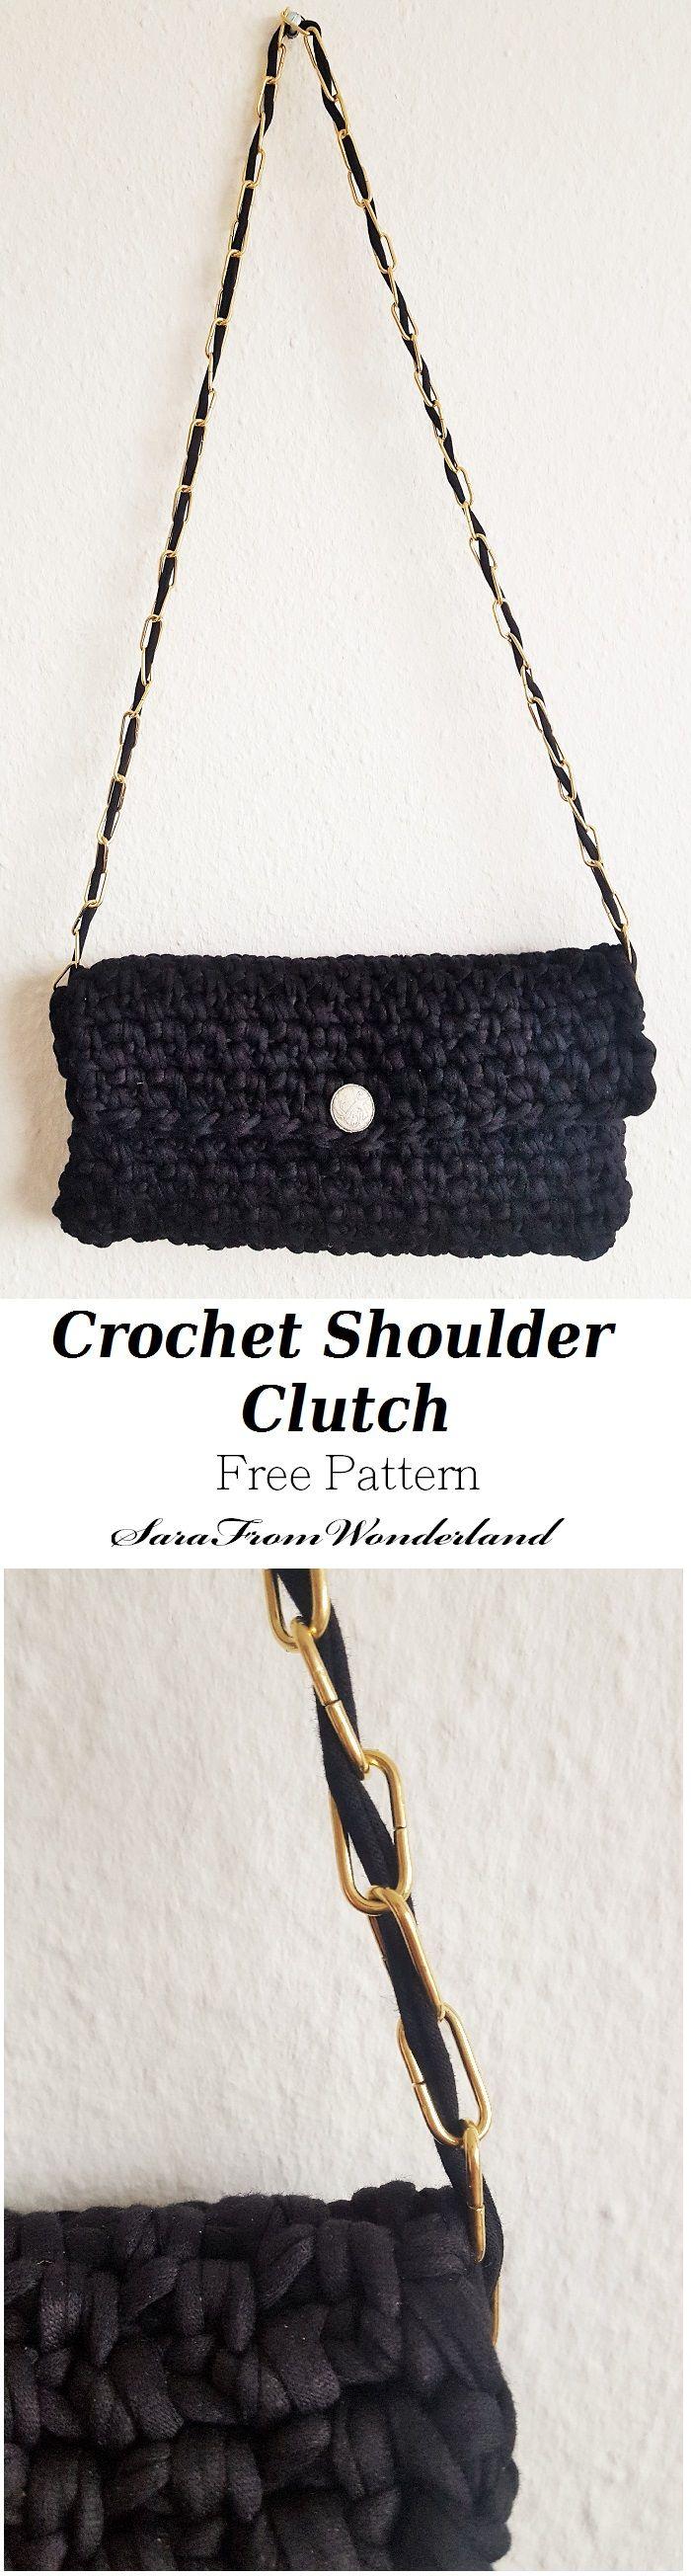 Crochet this elegant shoulder clutch from SaraFromWonderland